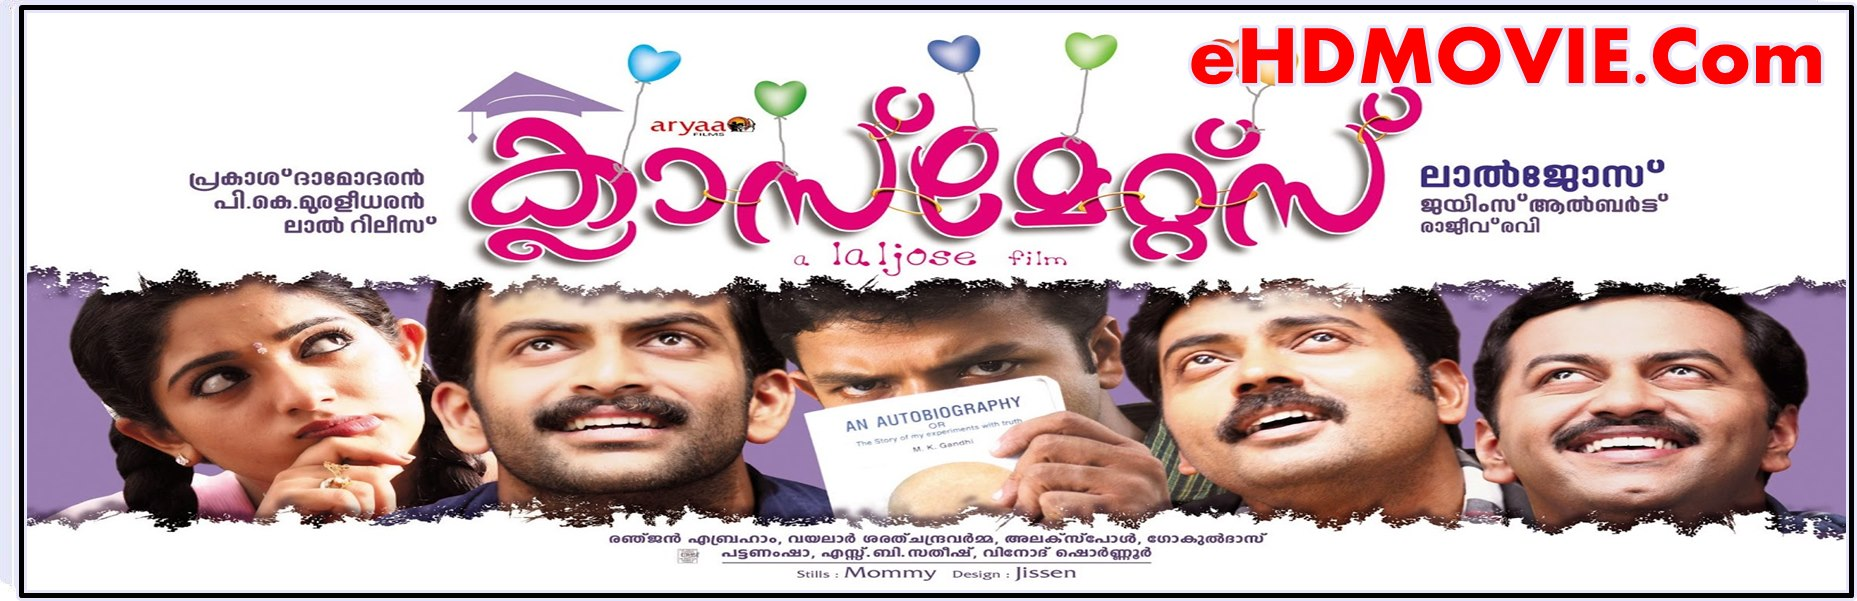 Classmates 2006 Full Movie Malayalam 720p - 480p ORG BRRip 400MB - 700MB ESubs Free Download